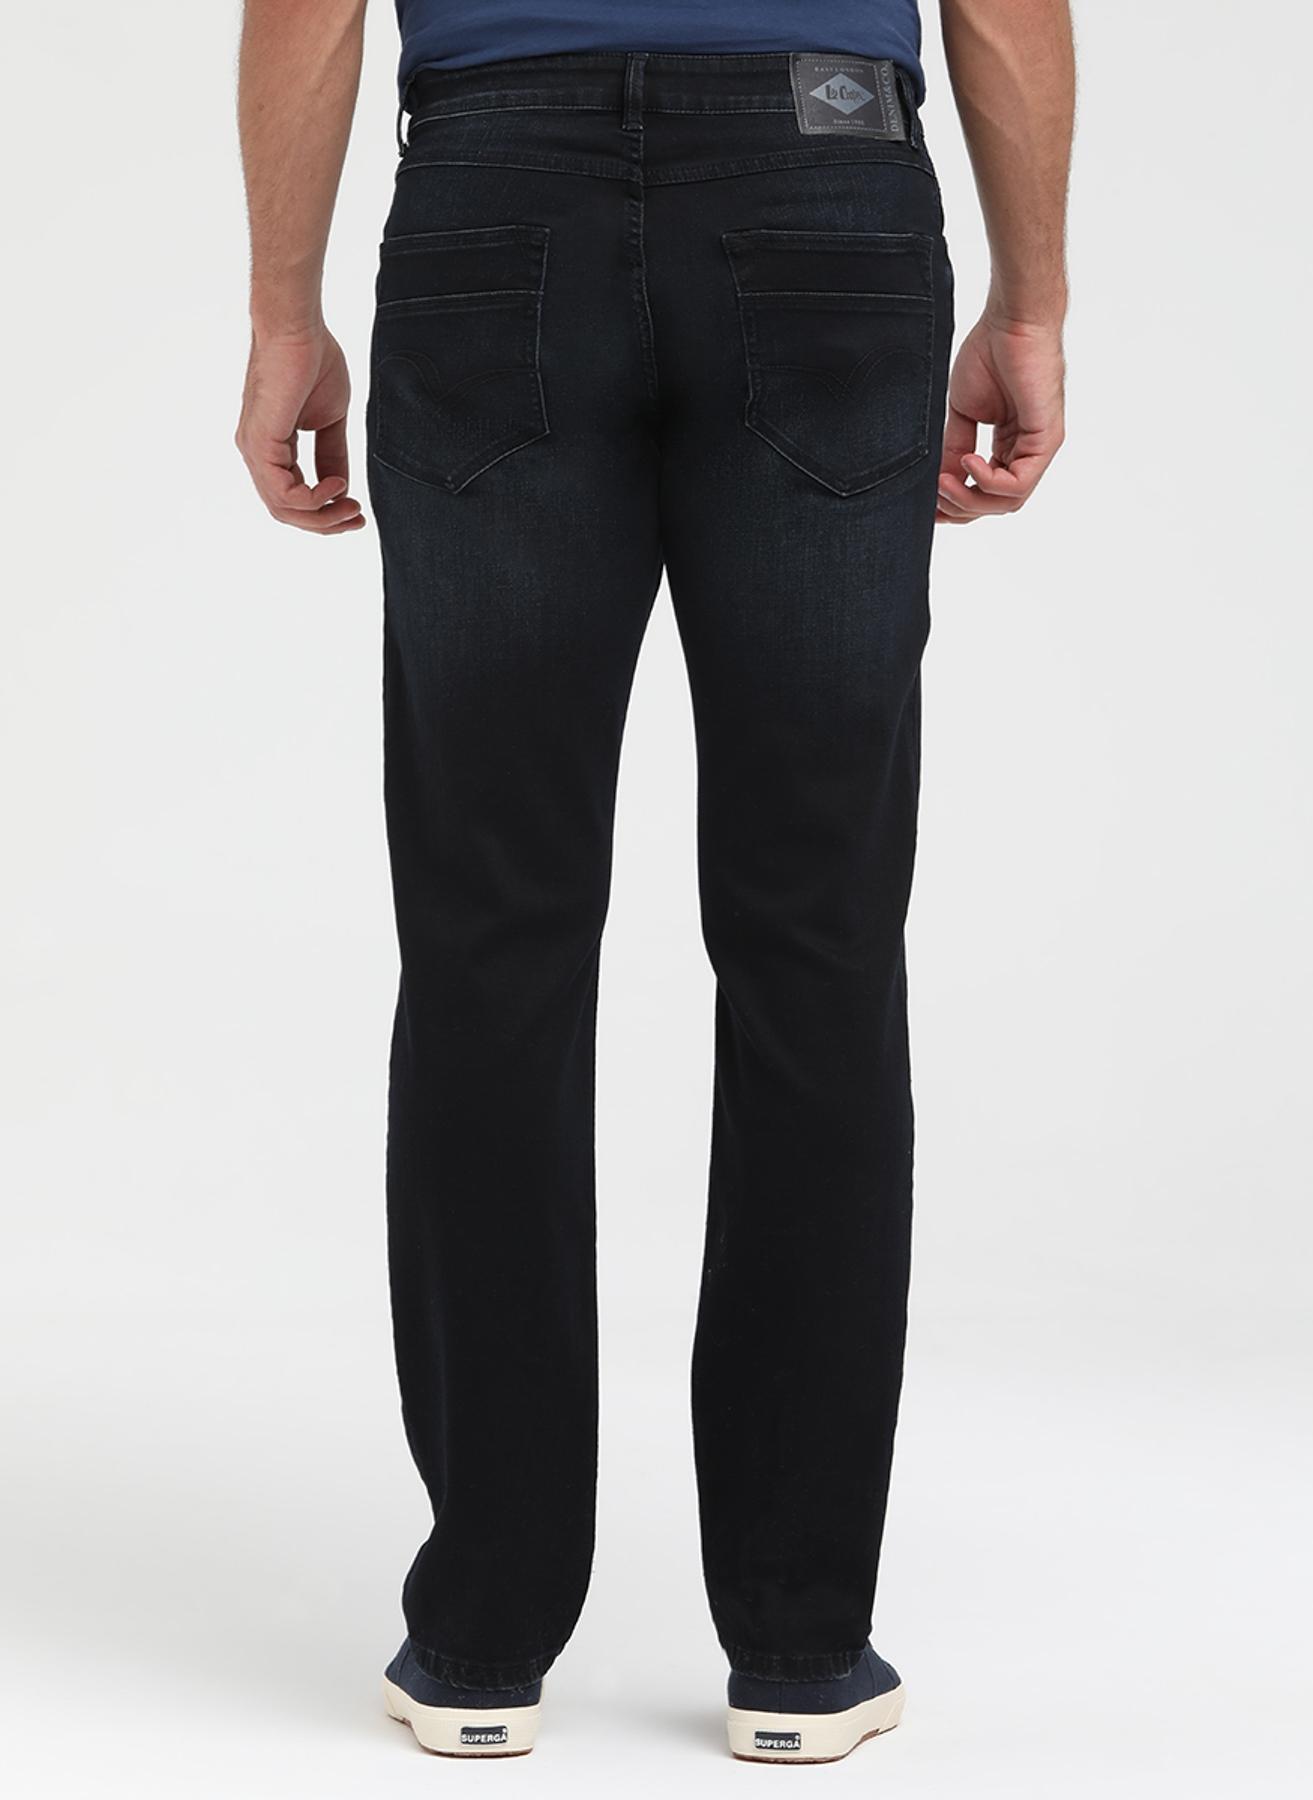 Lee Cooper Jagger Klasik Pantolon 32-32 5000200299011 Ürün Resmi